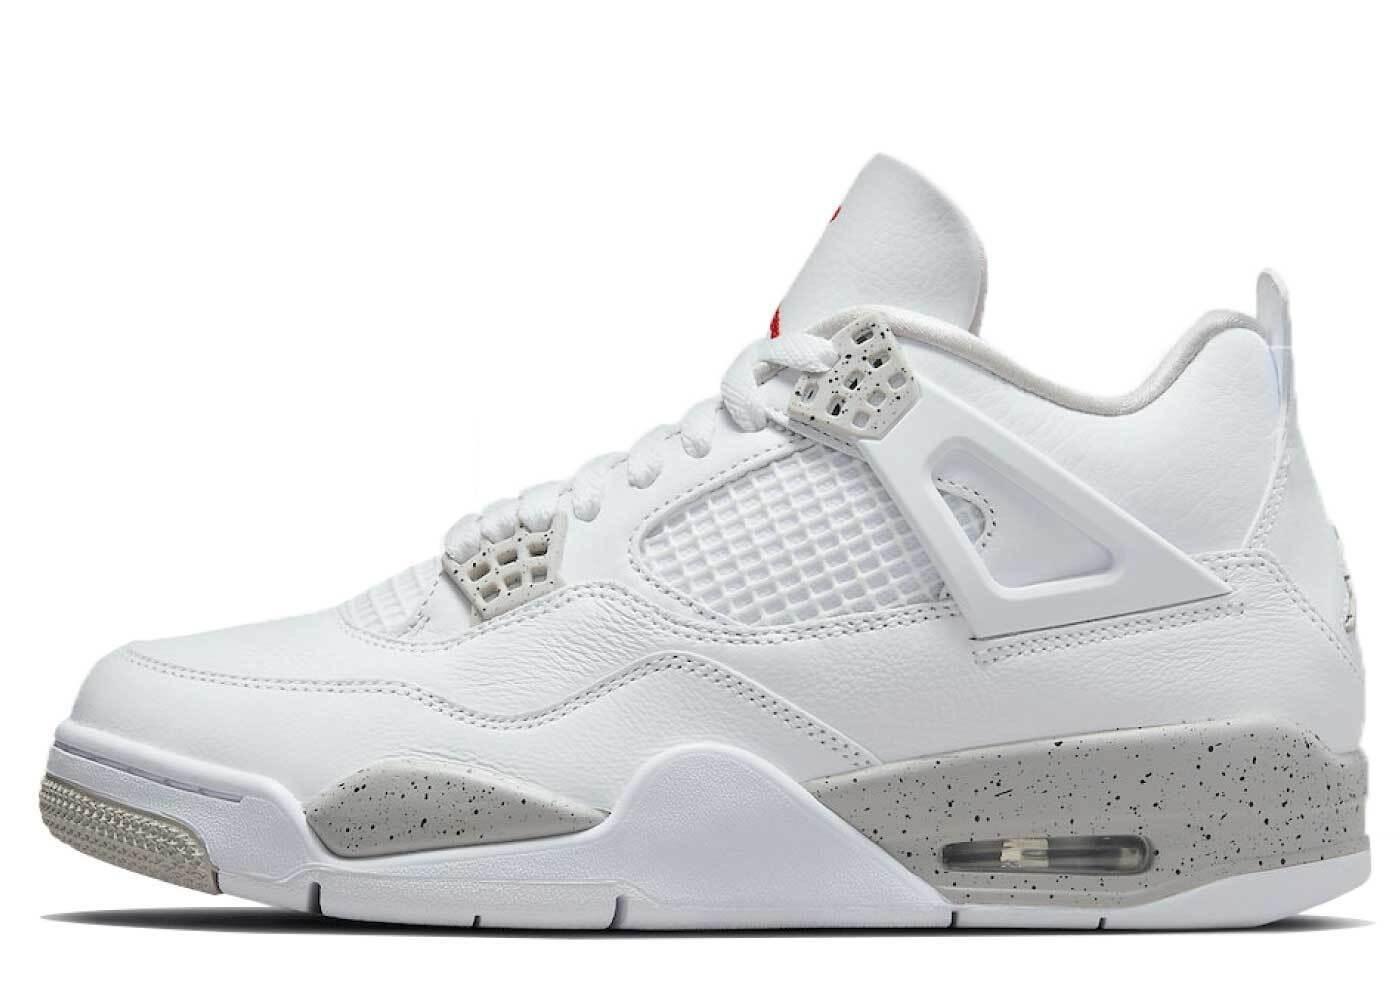 Nike Air Jordan 4 Retro White Oreoの写真